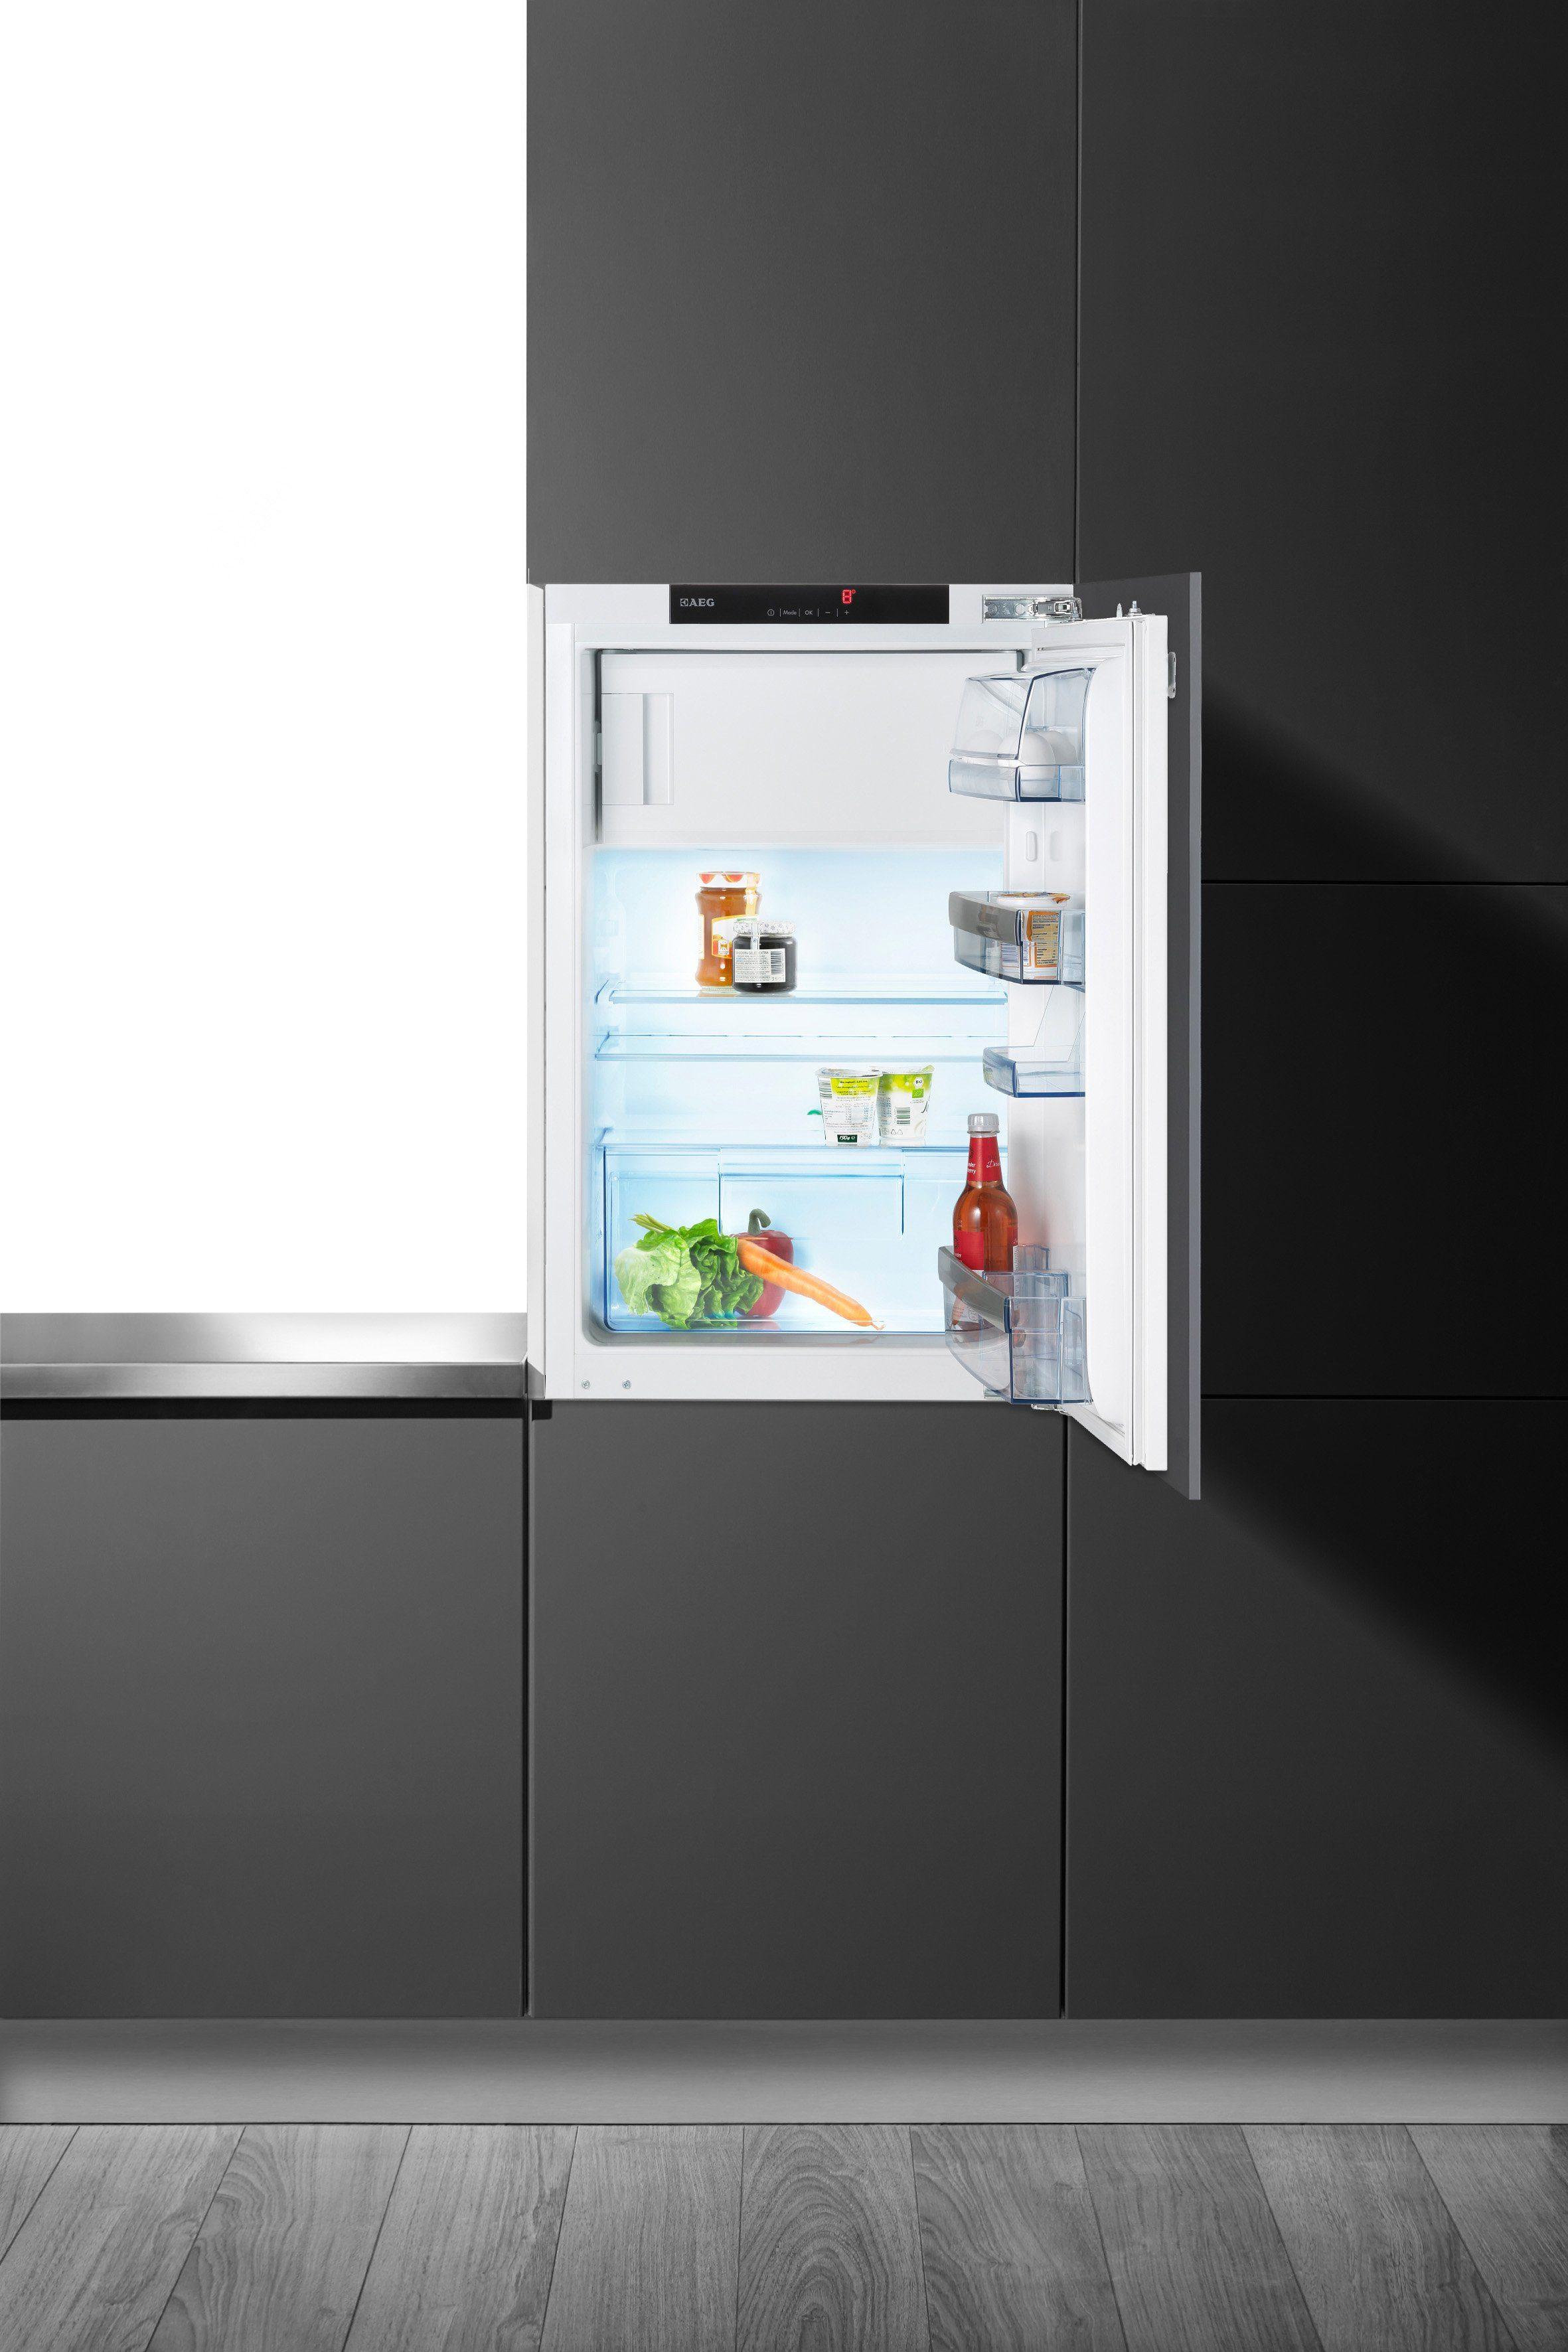 AEG Einbaukühlschrank SANTO SKS98840F1, Energieklasse A+++